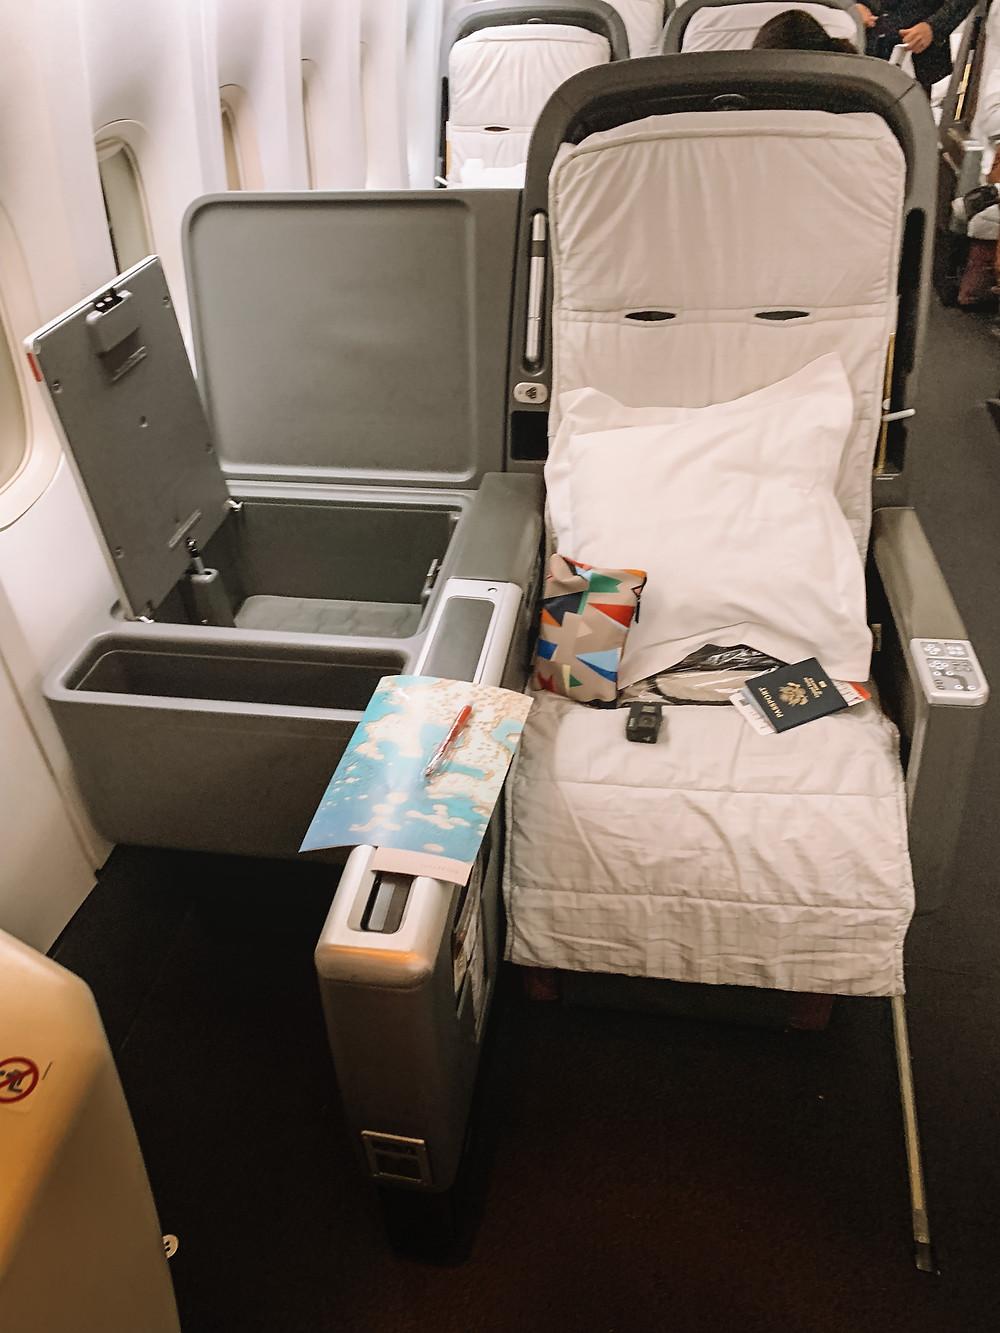 Qantas full flat business class seat to Australia